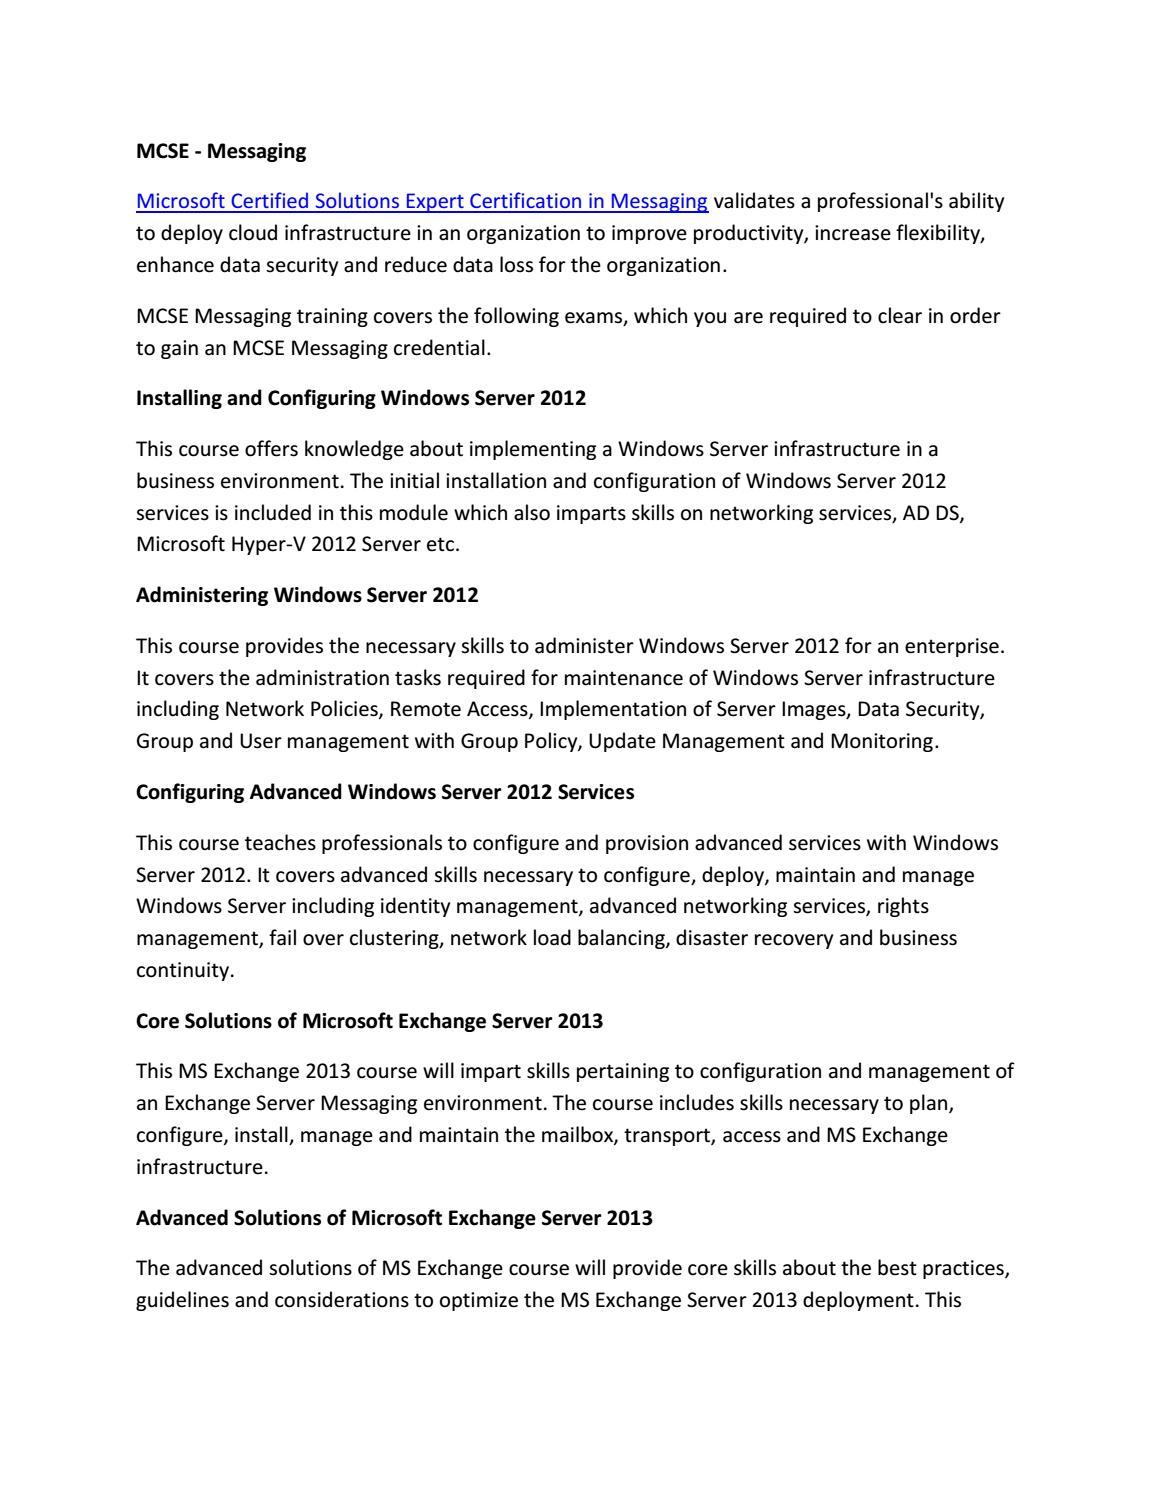 MCSE - Messaging by John peter - issuu